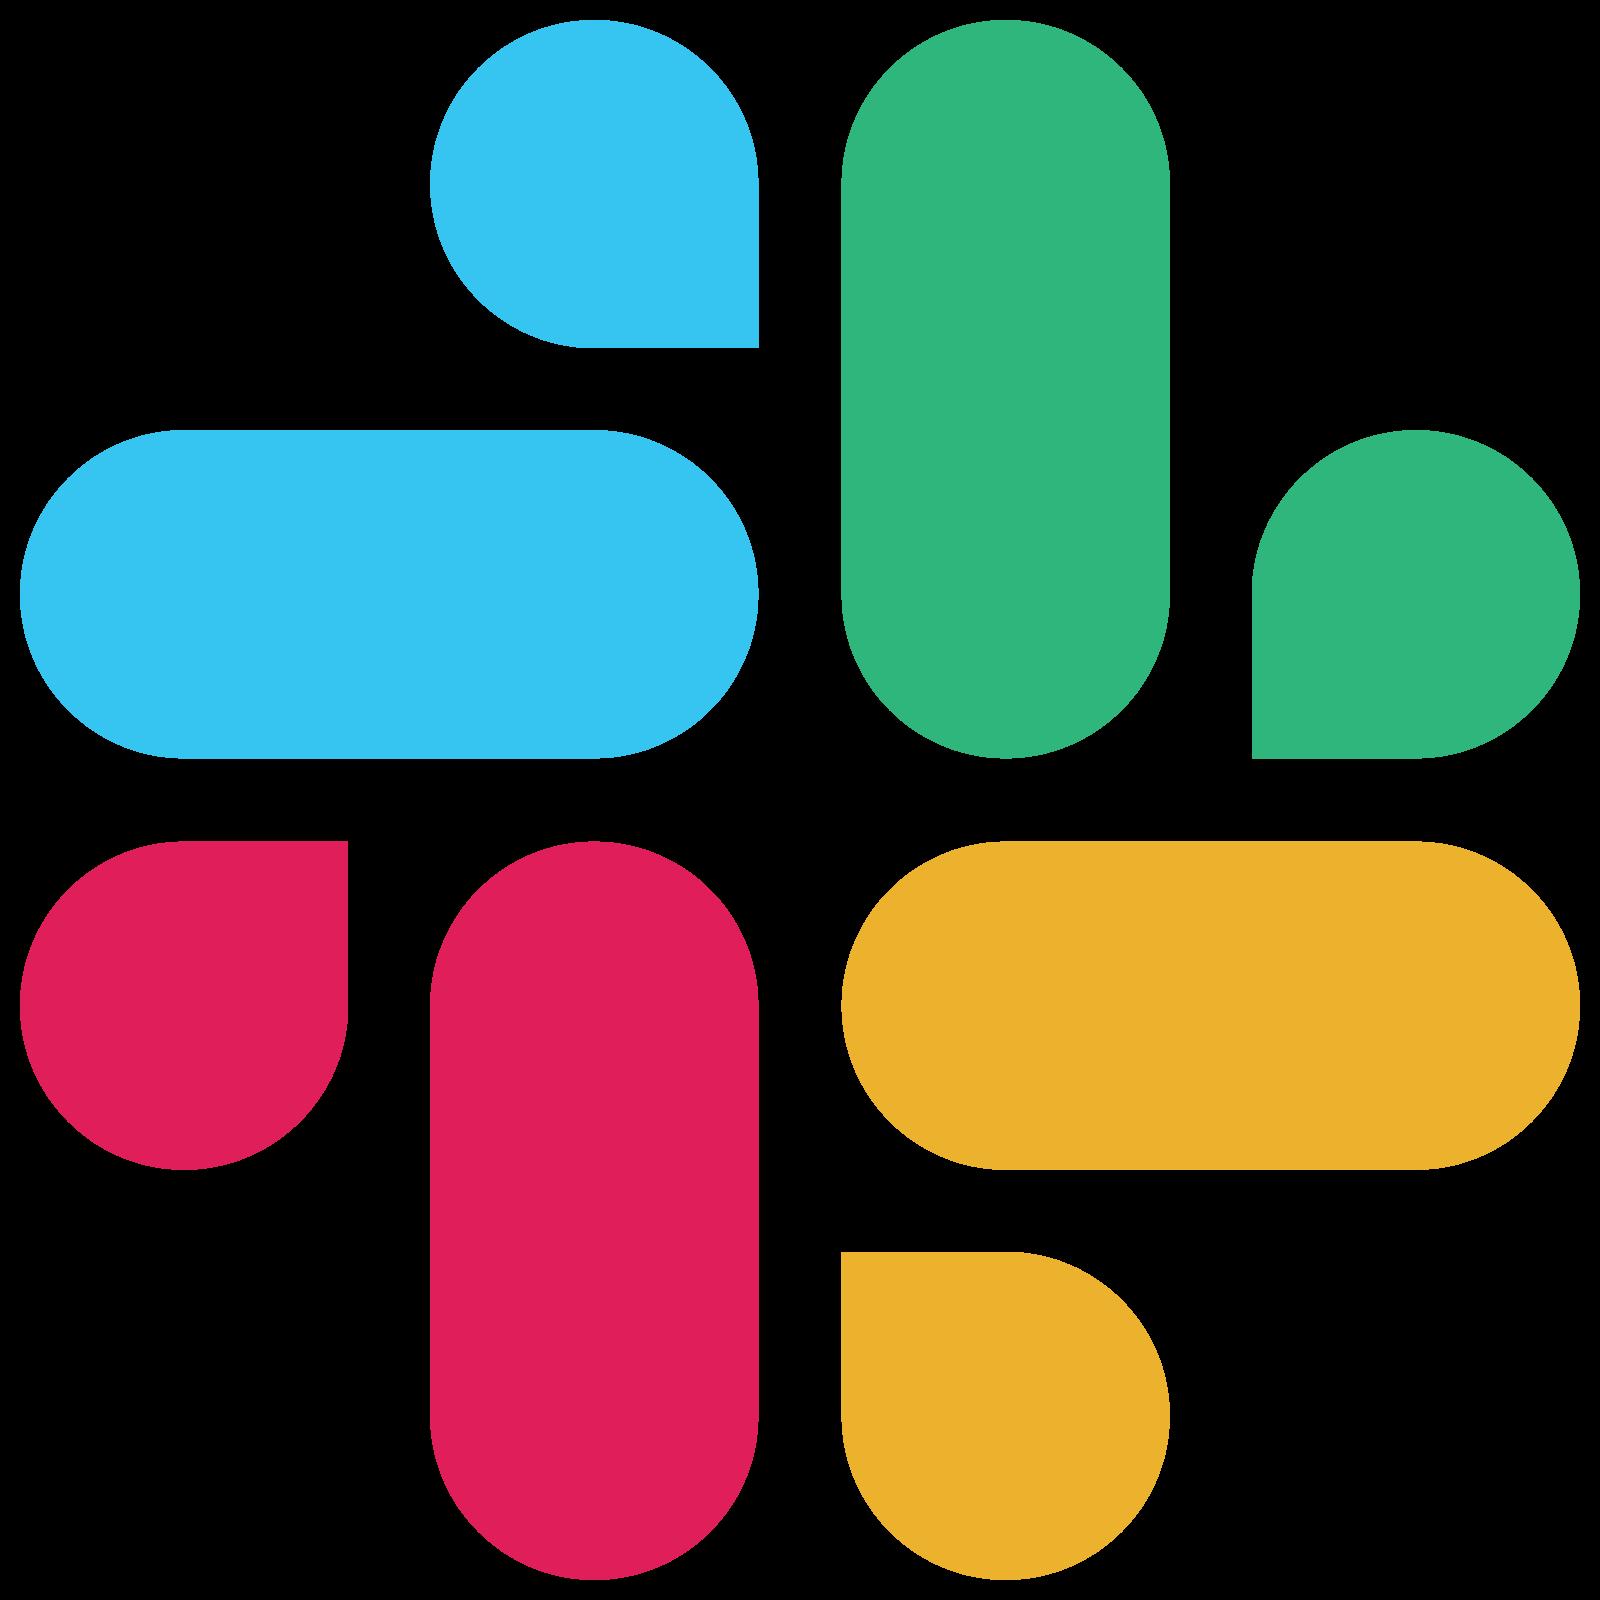 Logotipo do Slack